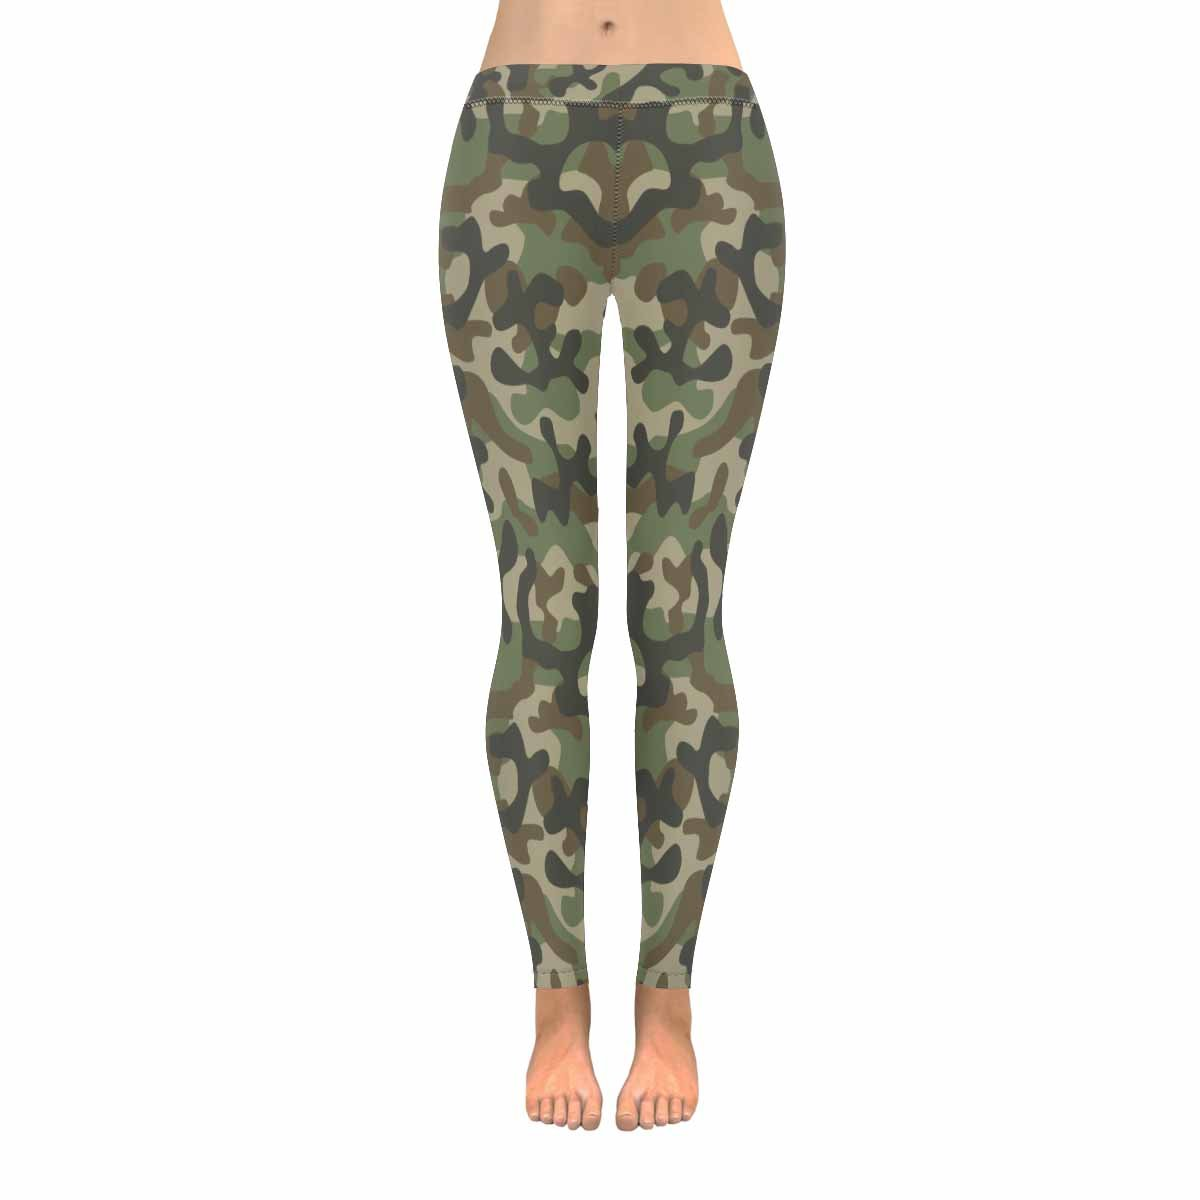 8259b99d4c0fb InterestPrint Triangle Geometric Mosaic Tiles Camo Camouflage Stretchy  Capri Leggings Skinny Yoga Running Pants for Women 2XS-5XL SIZE: XXS, XS,  S, M, L, ...